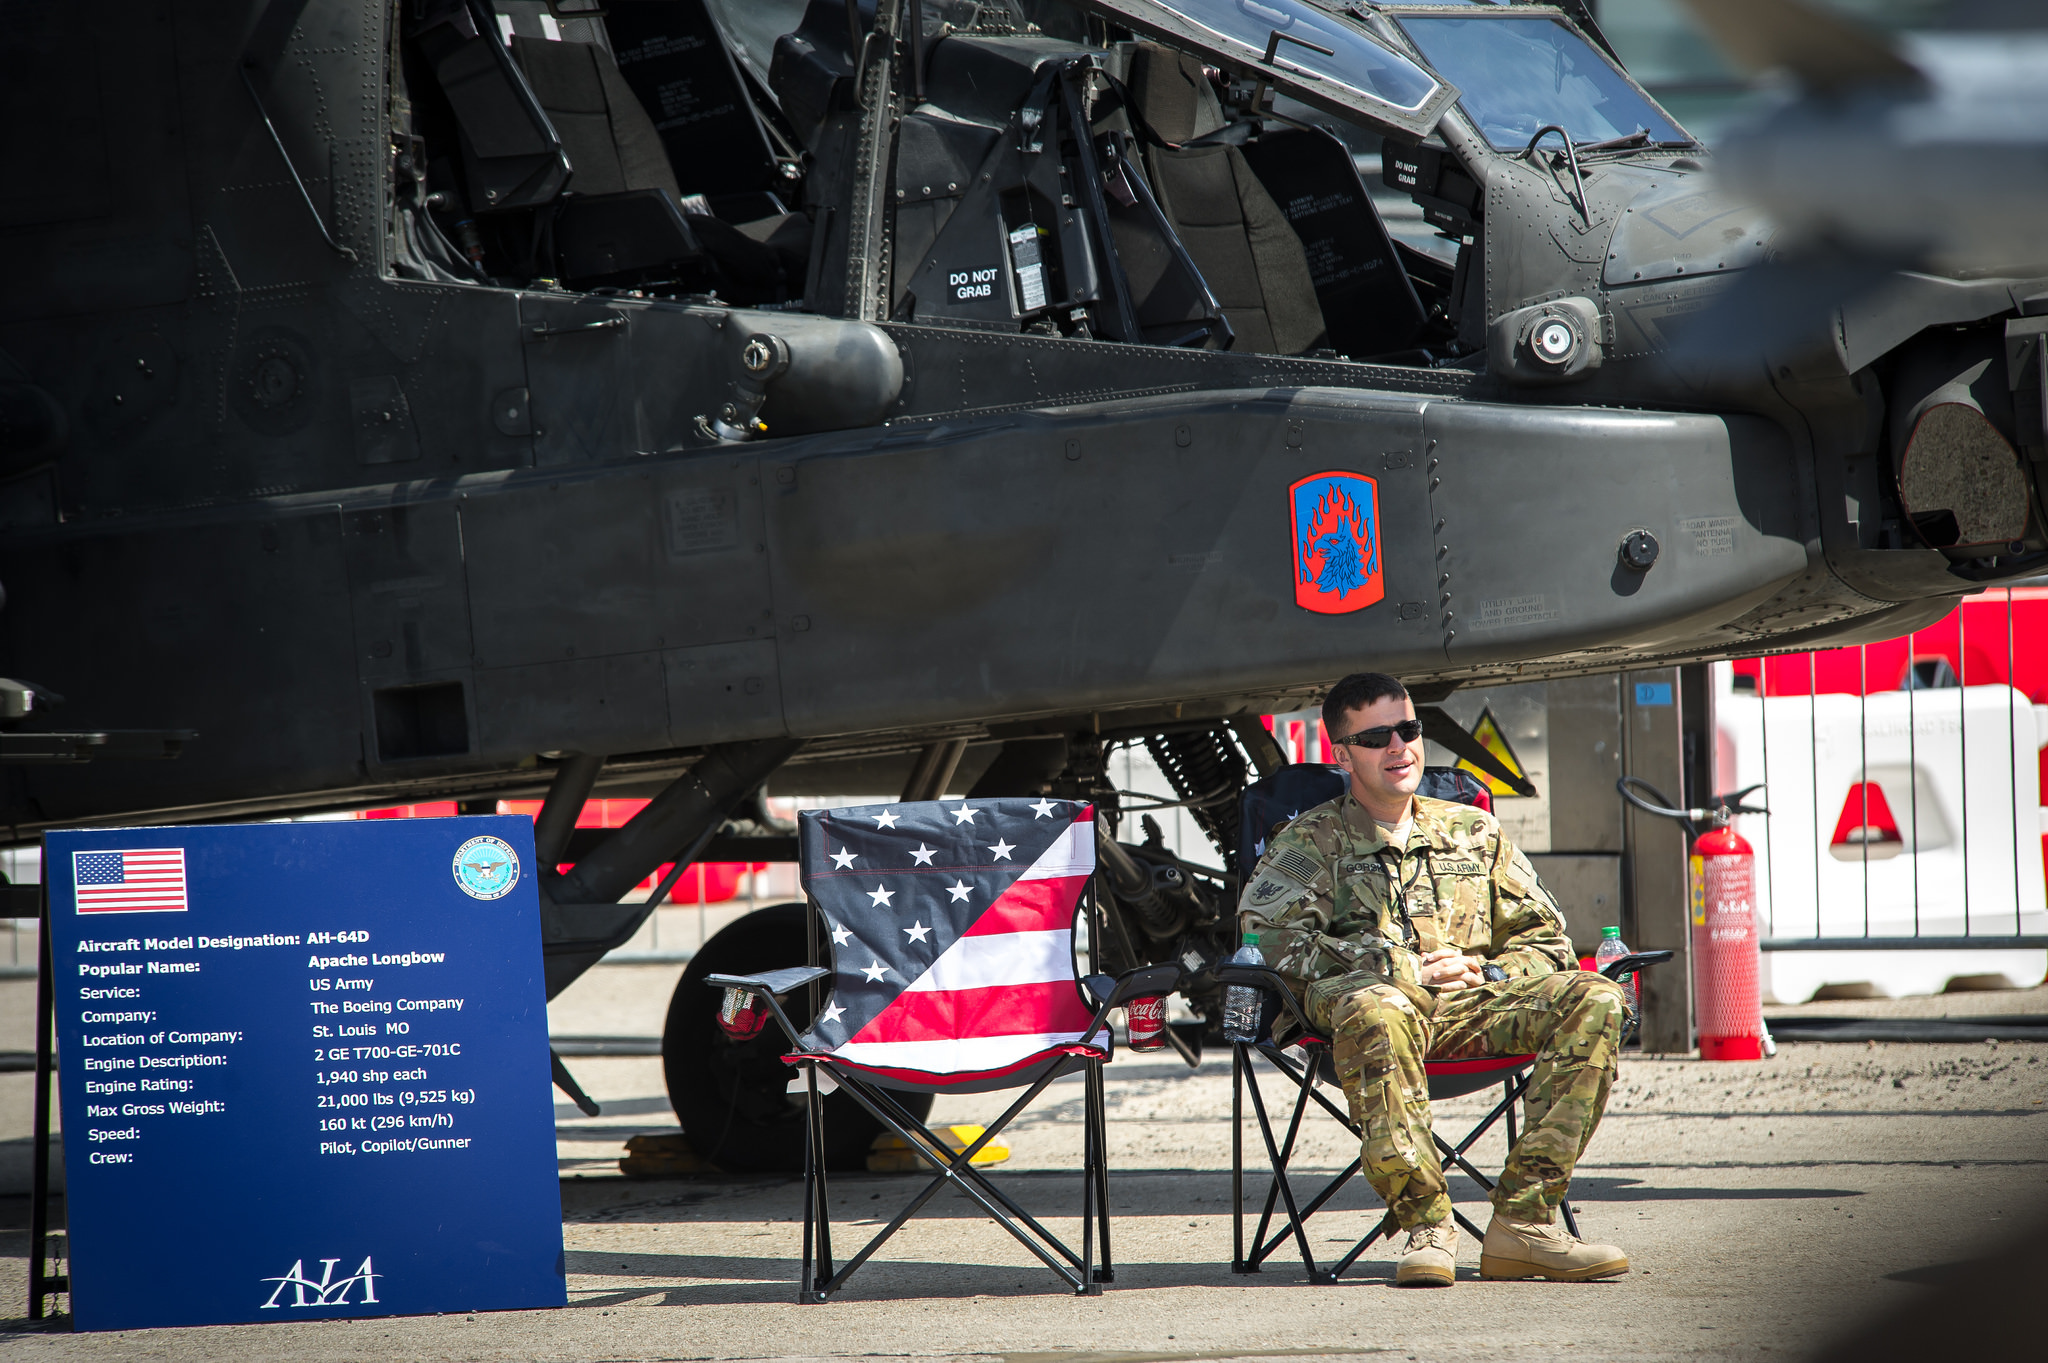 United states european command for Air show paris 2015